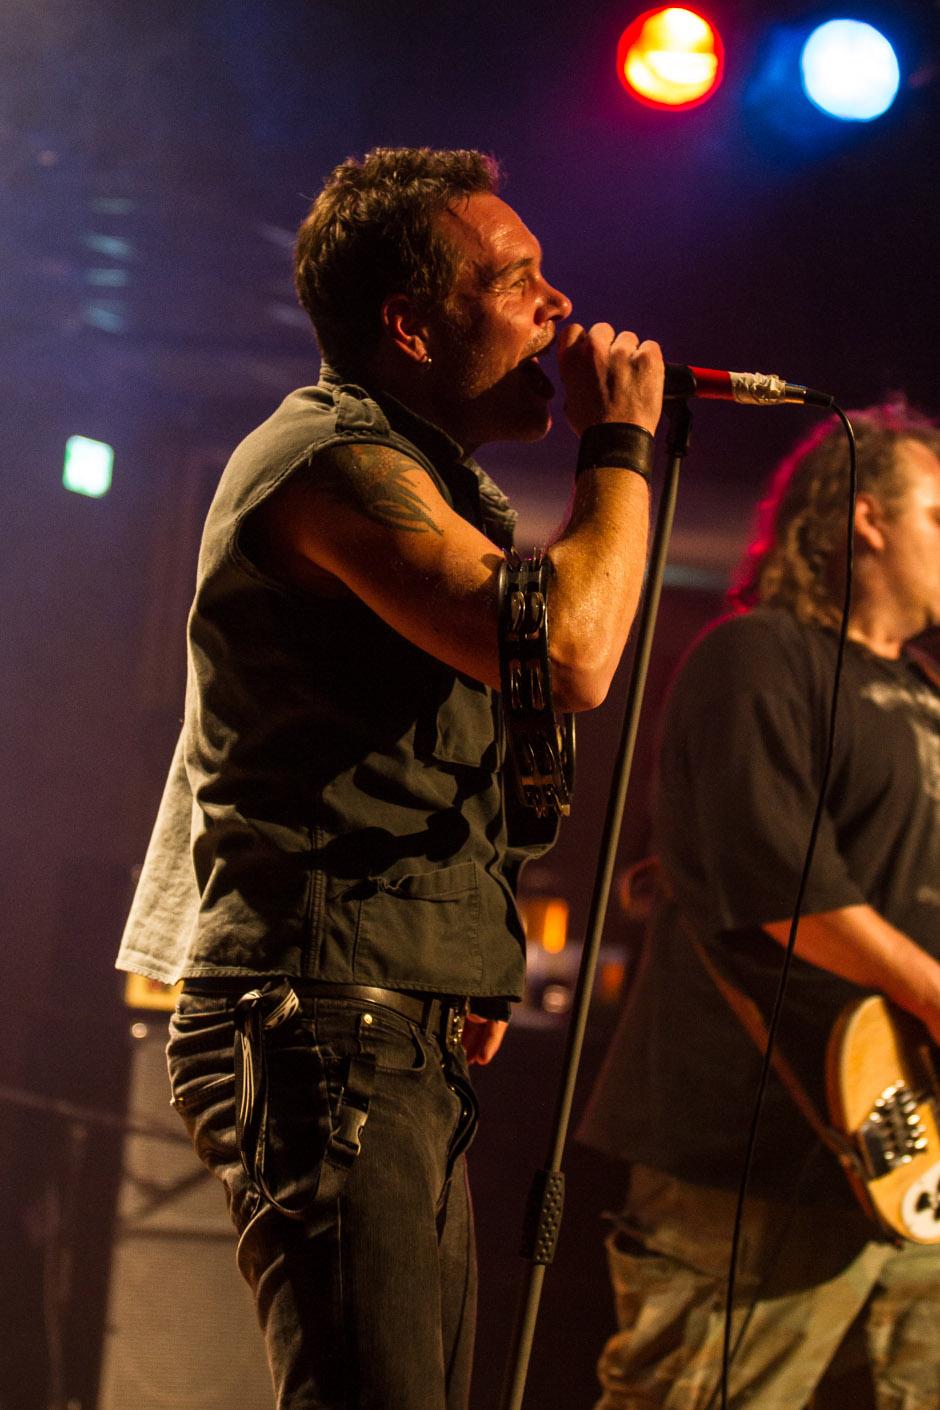 Hellboys live, 16.02.2013, Hamurg